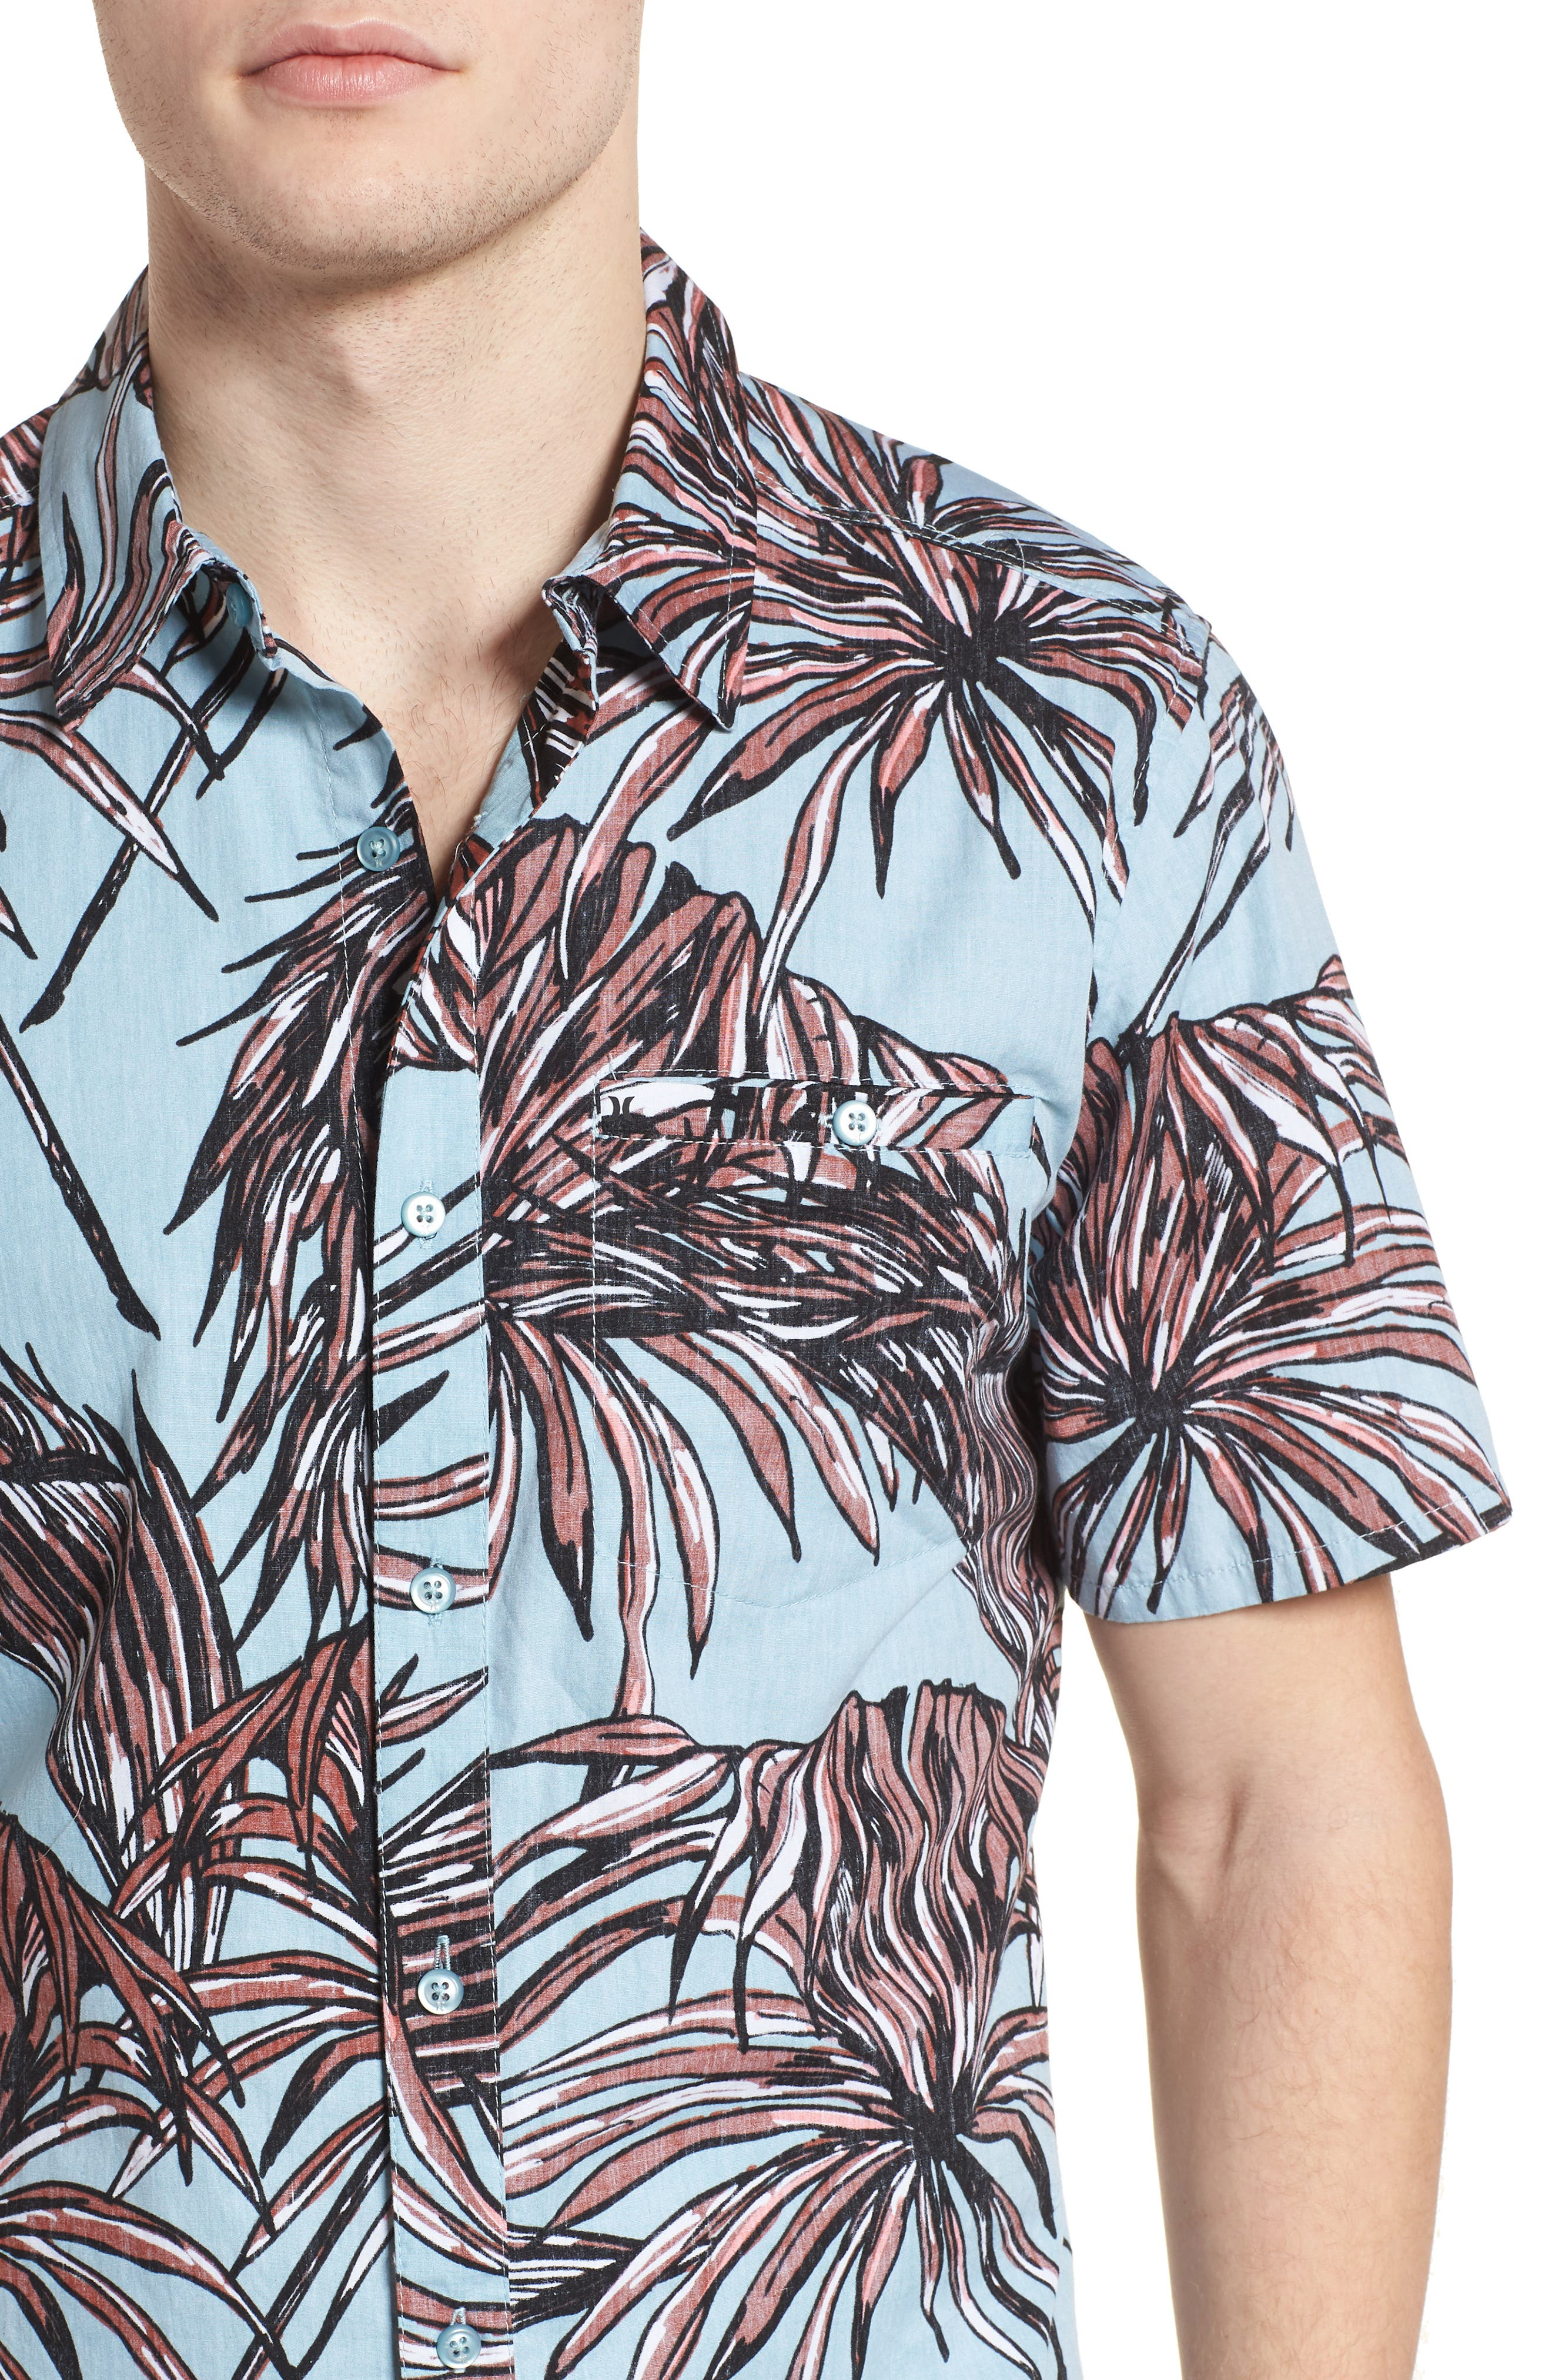 Koko Shirt,                             Alternate thumbnail 2, color,                             Ocean Bliss